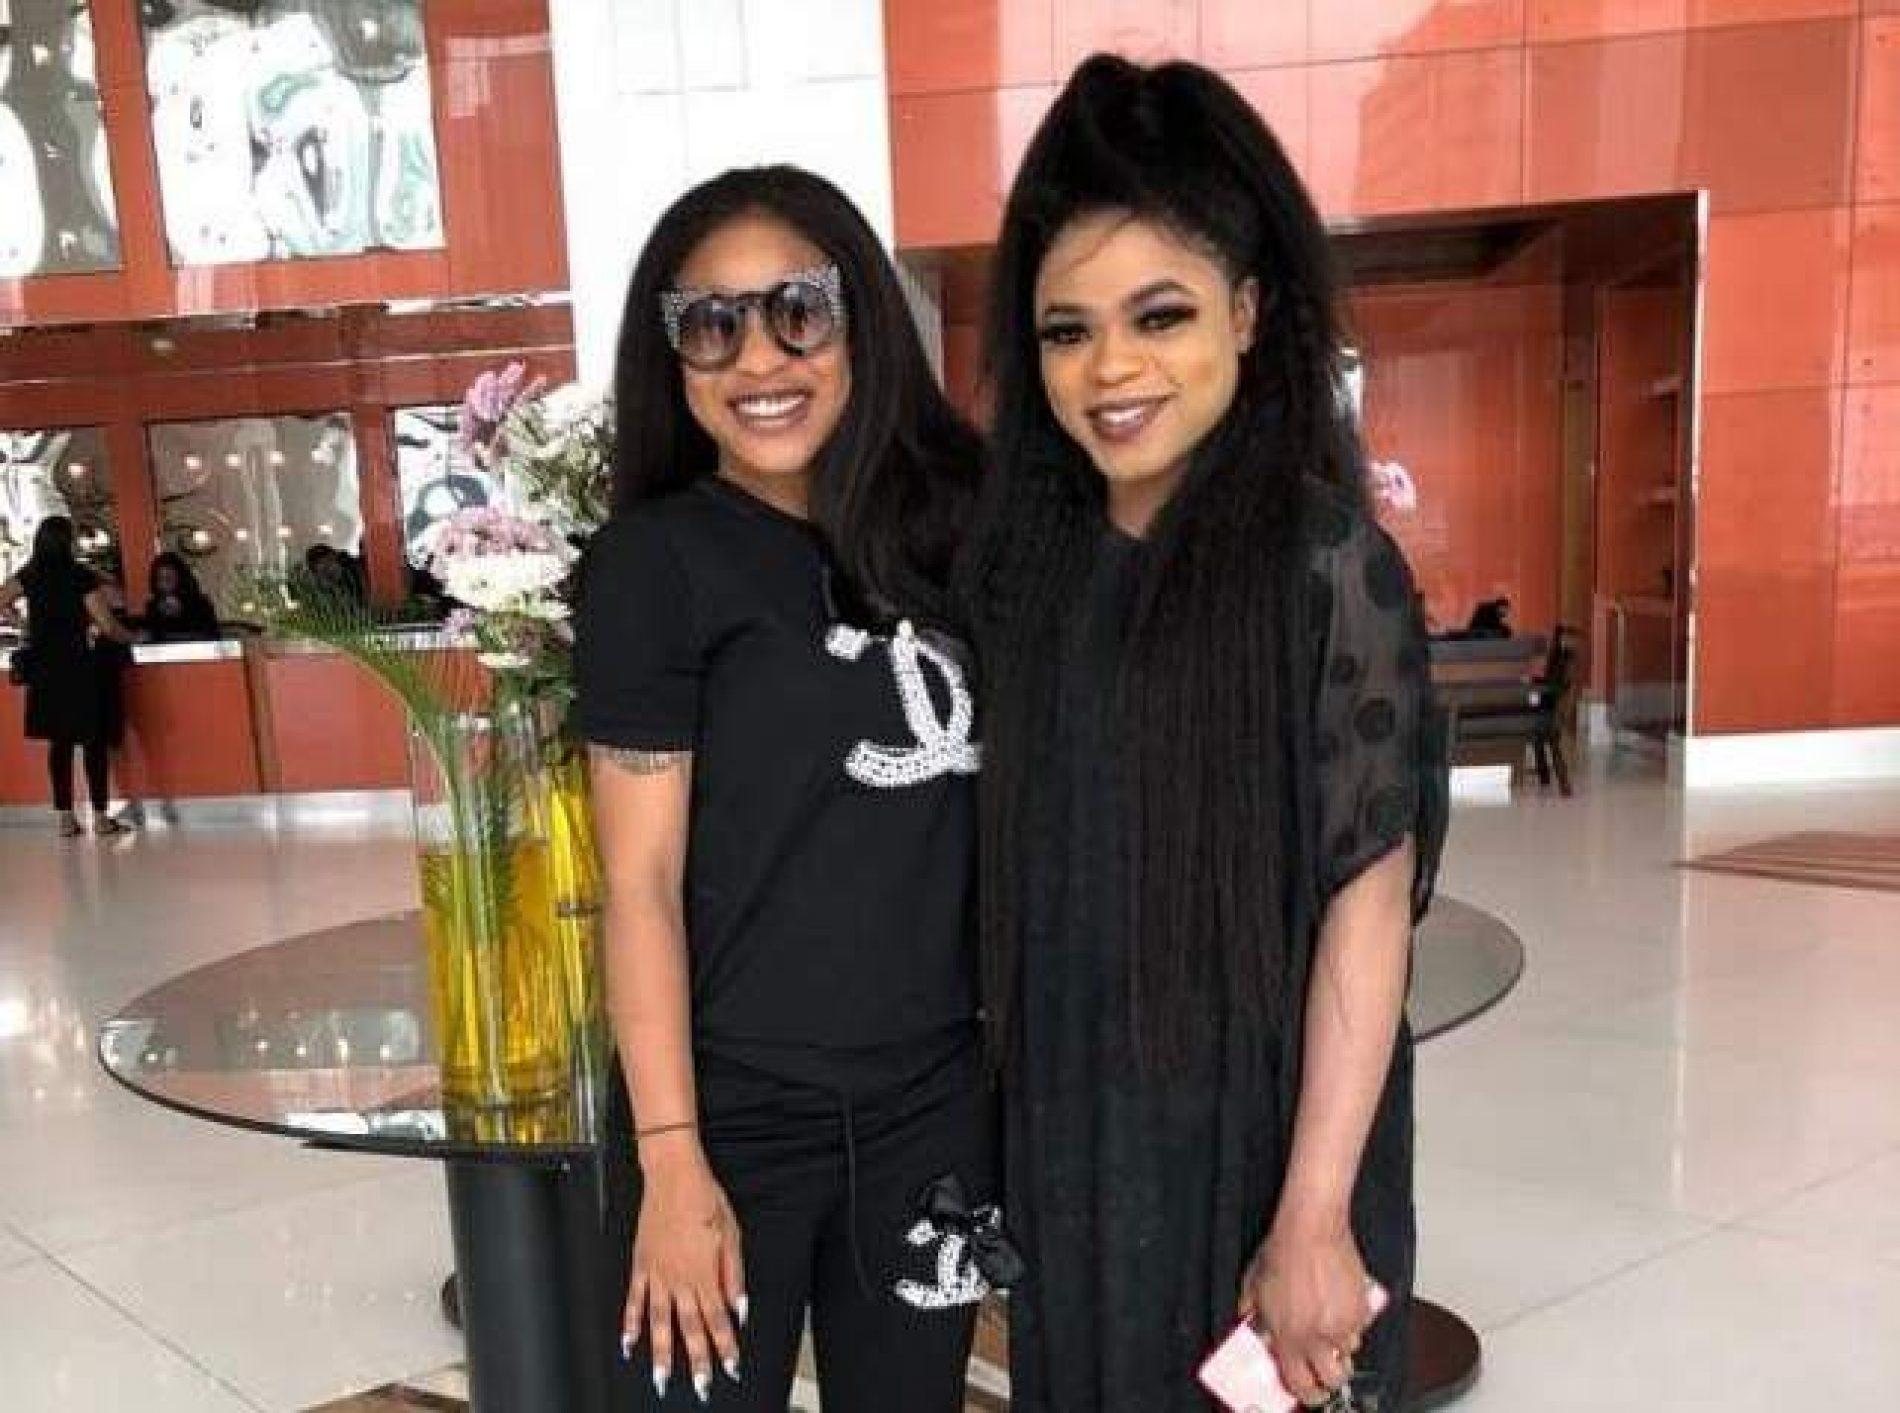 Tonto Dikeh and Bobrisky are Nigeria's latest celebrity besties